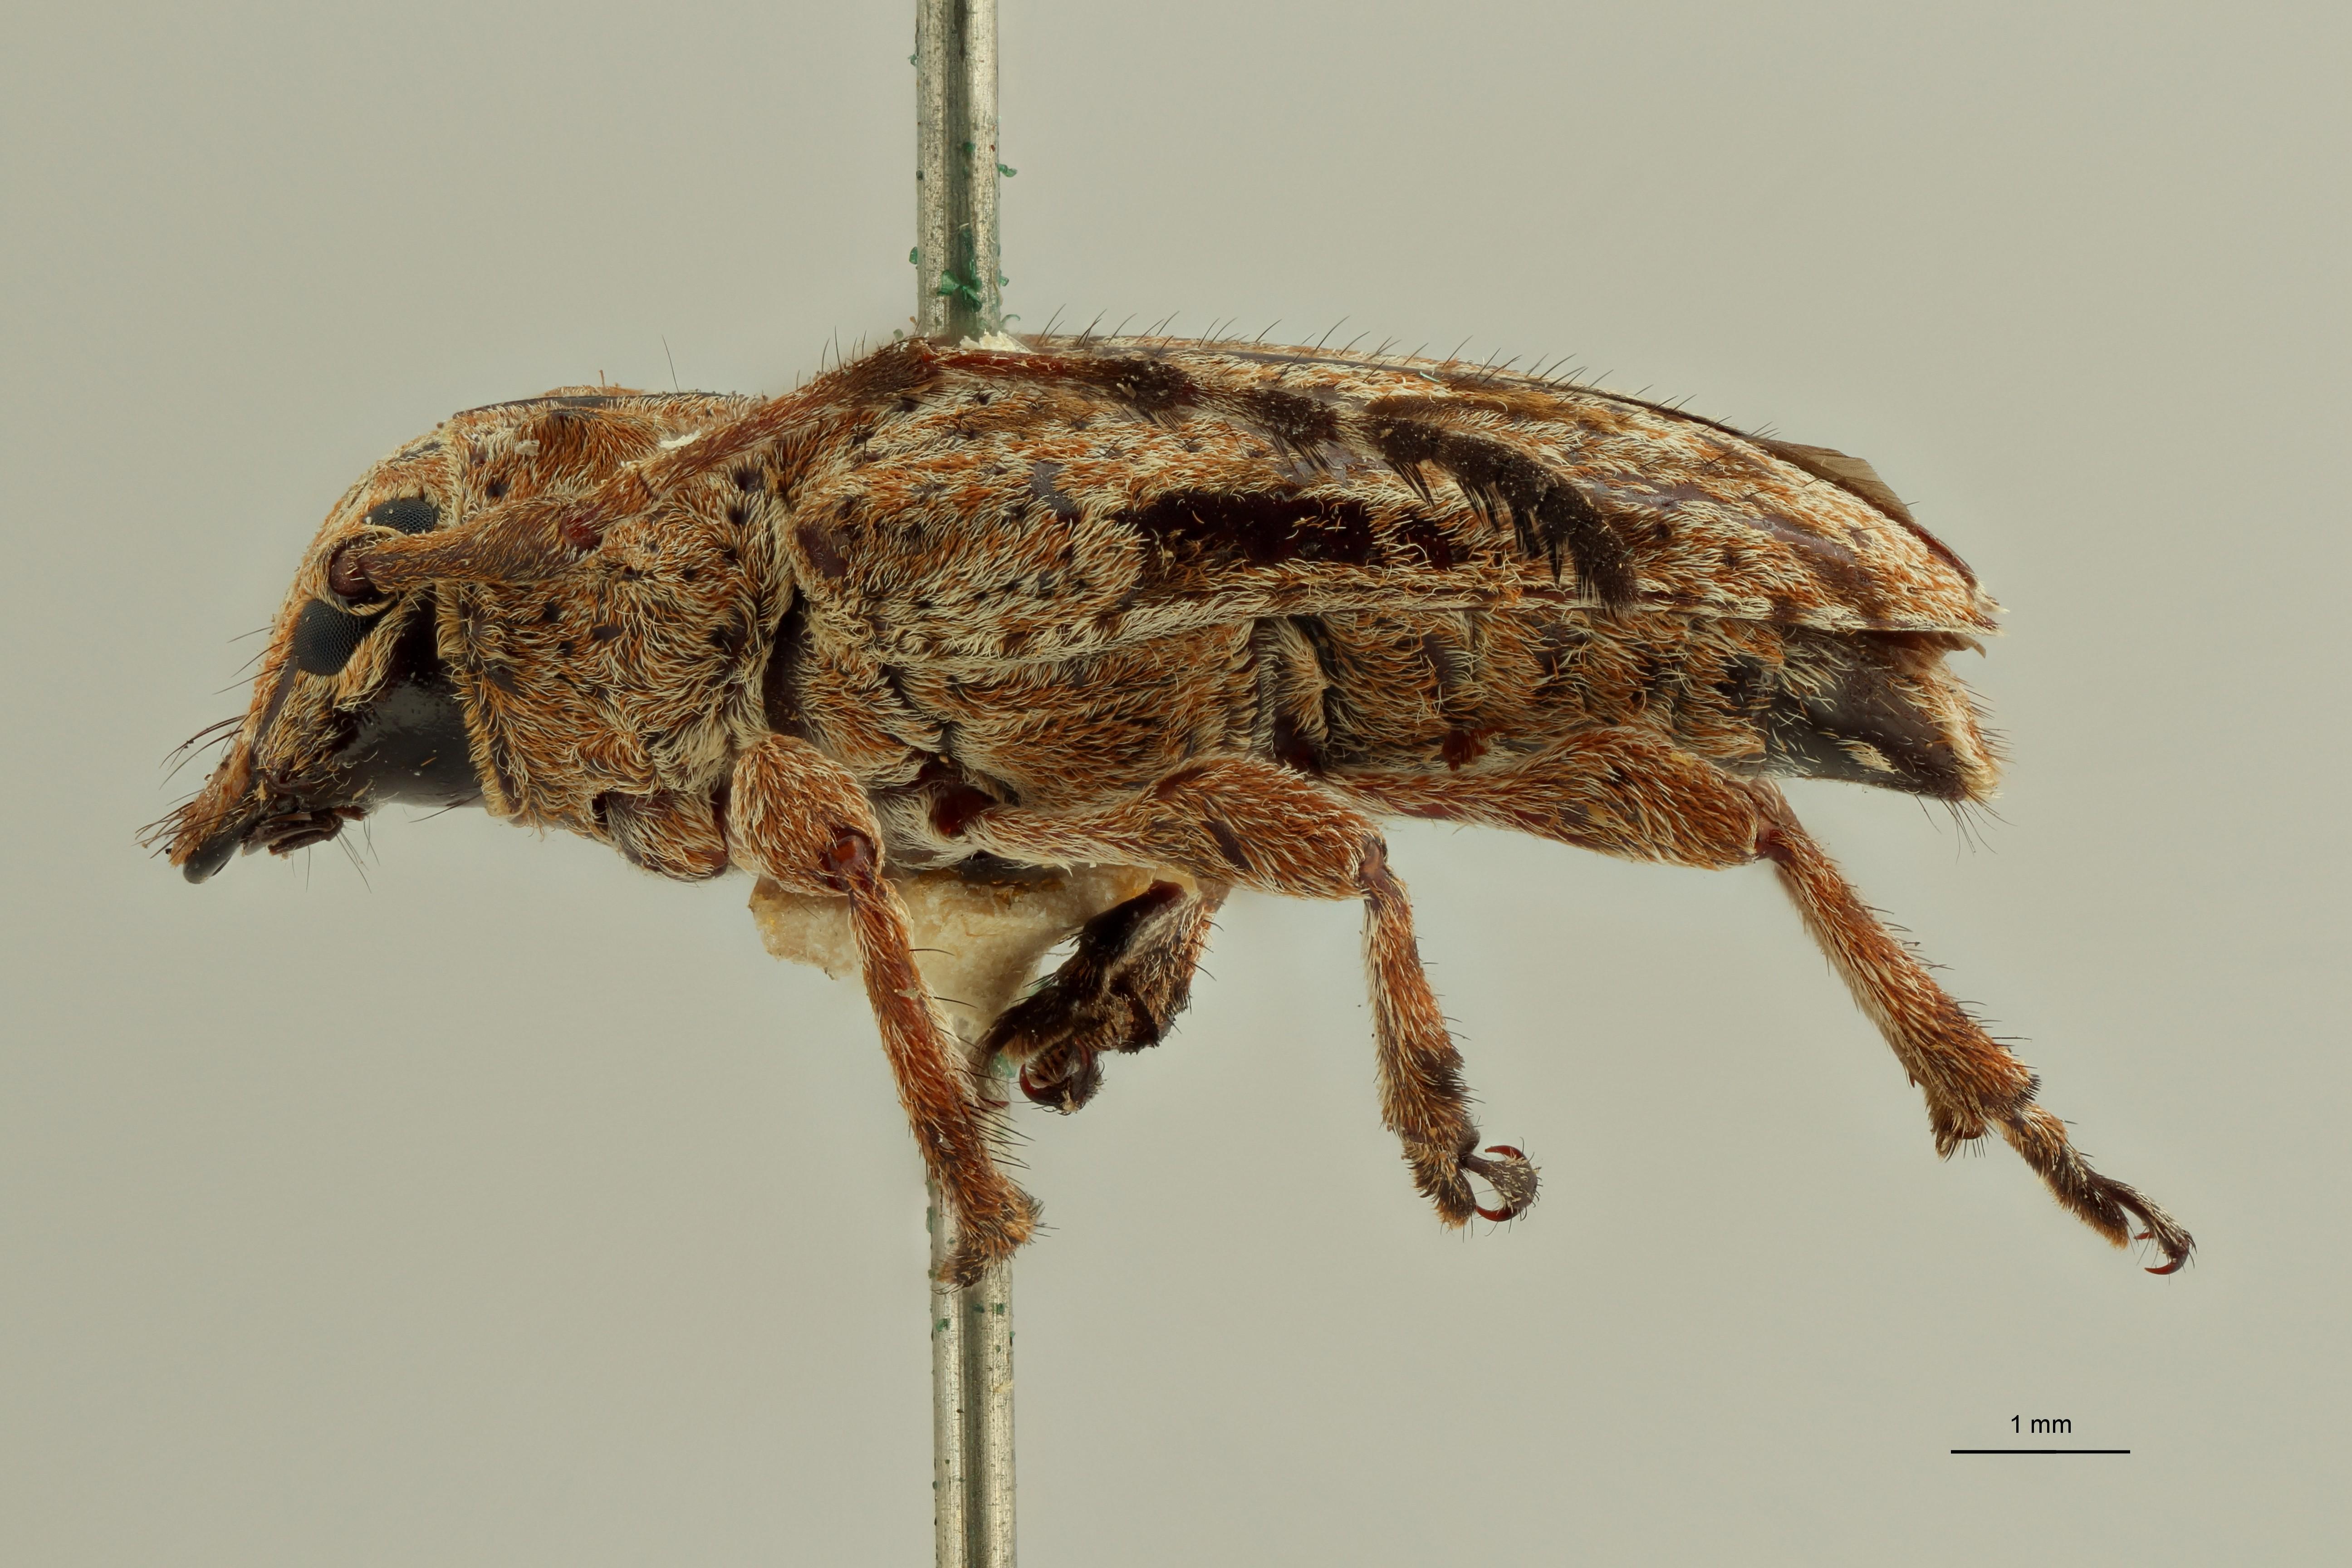 Sychnomerus hirticornis pt1 L ZS PMax Scaled.jpeg